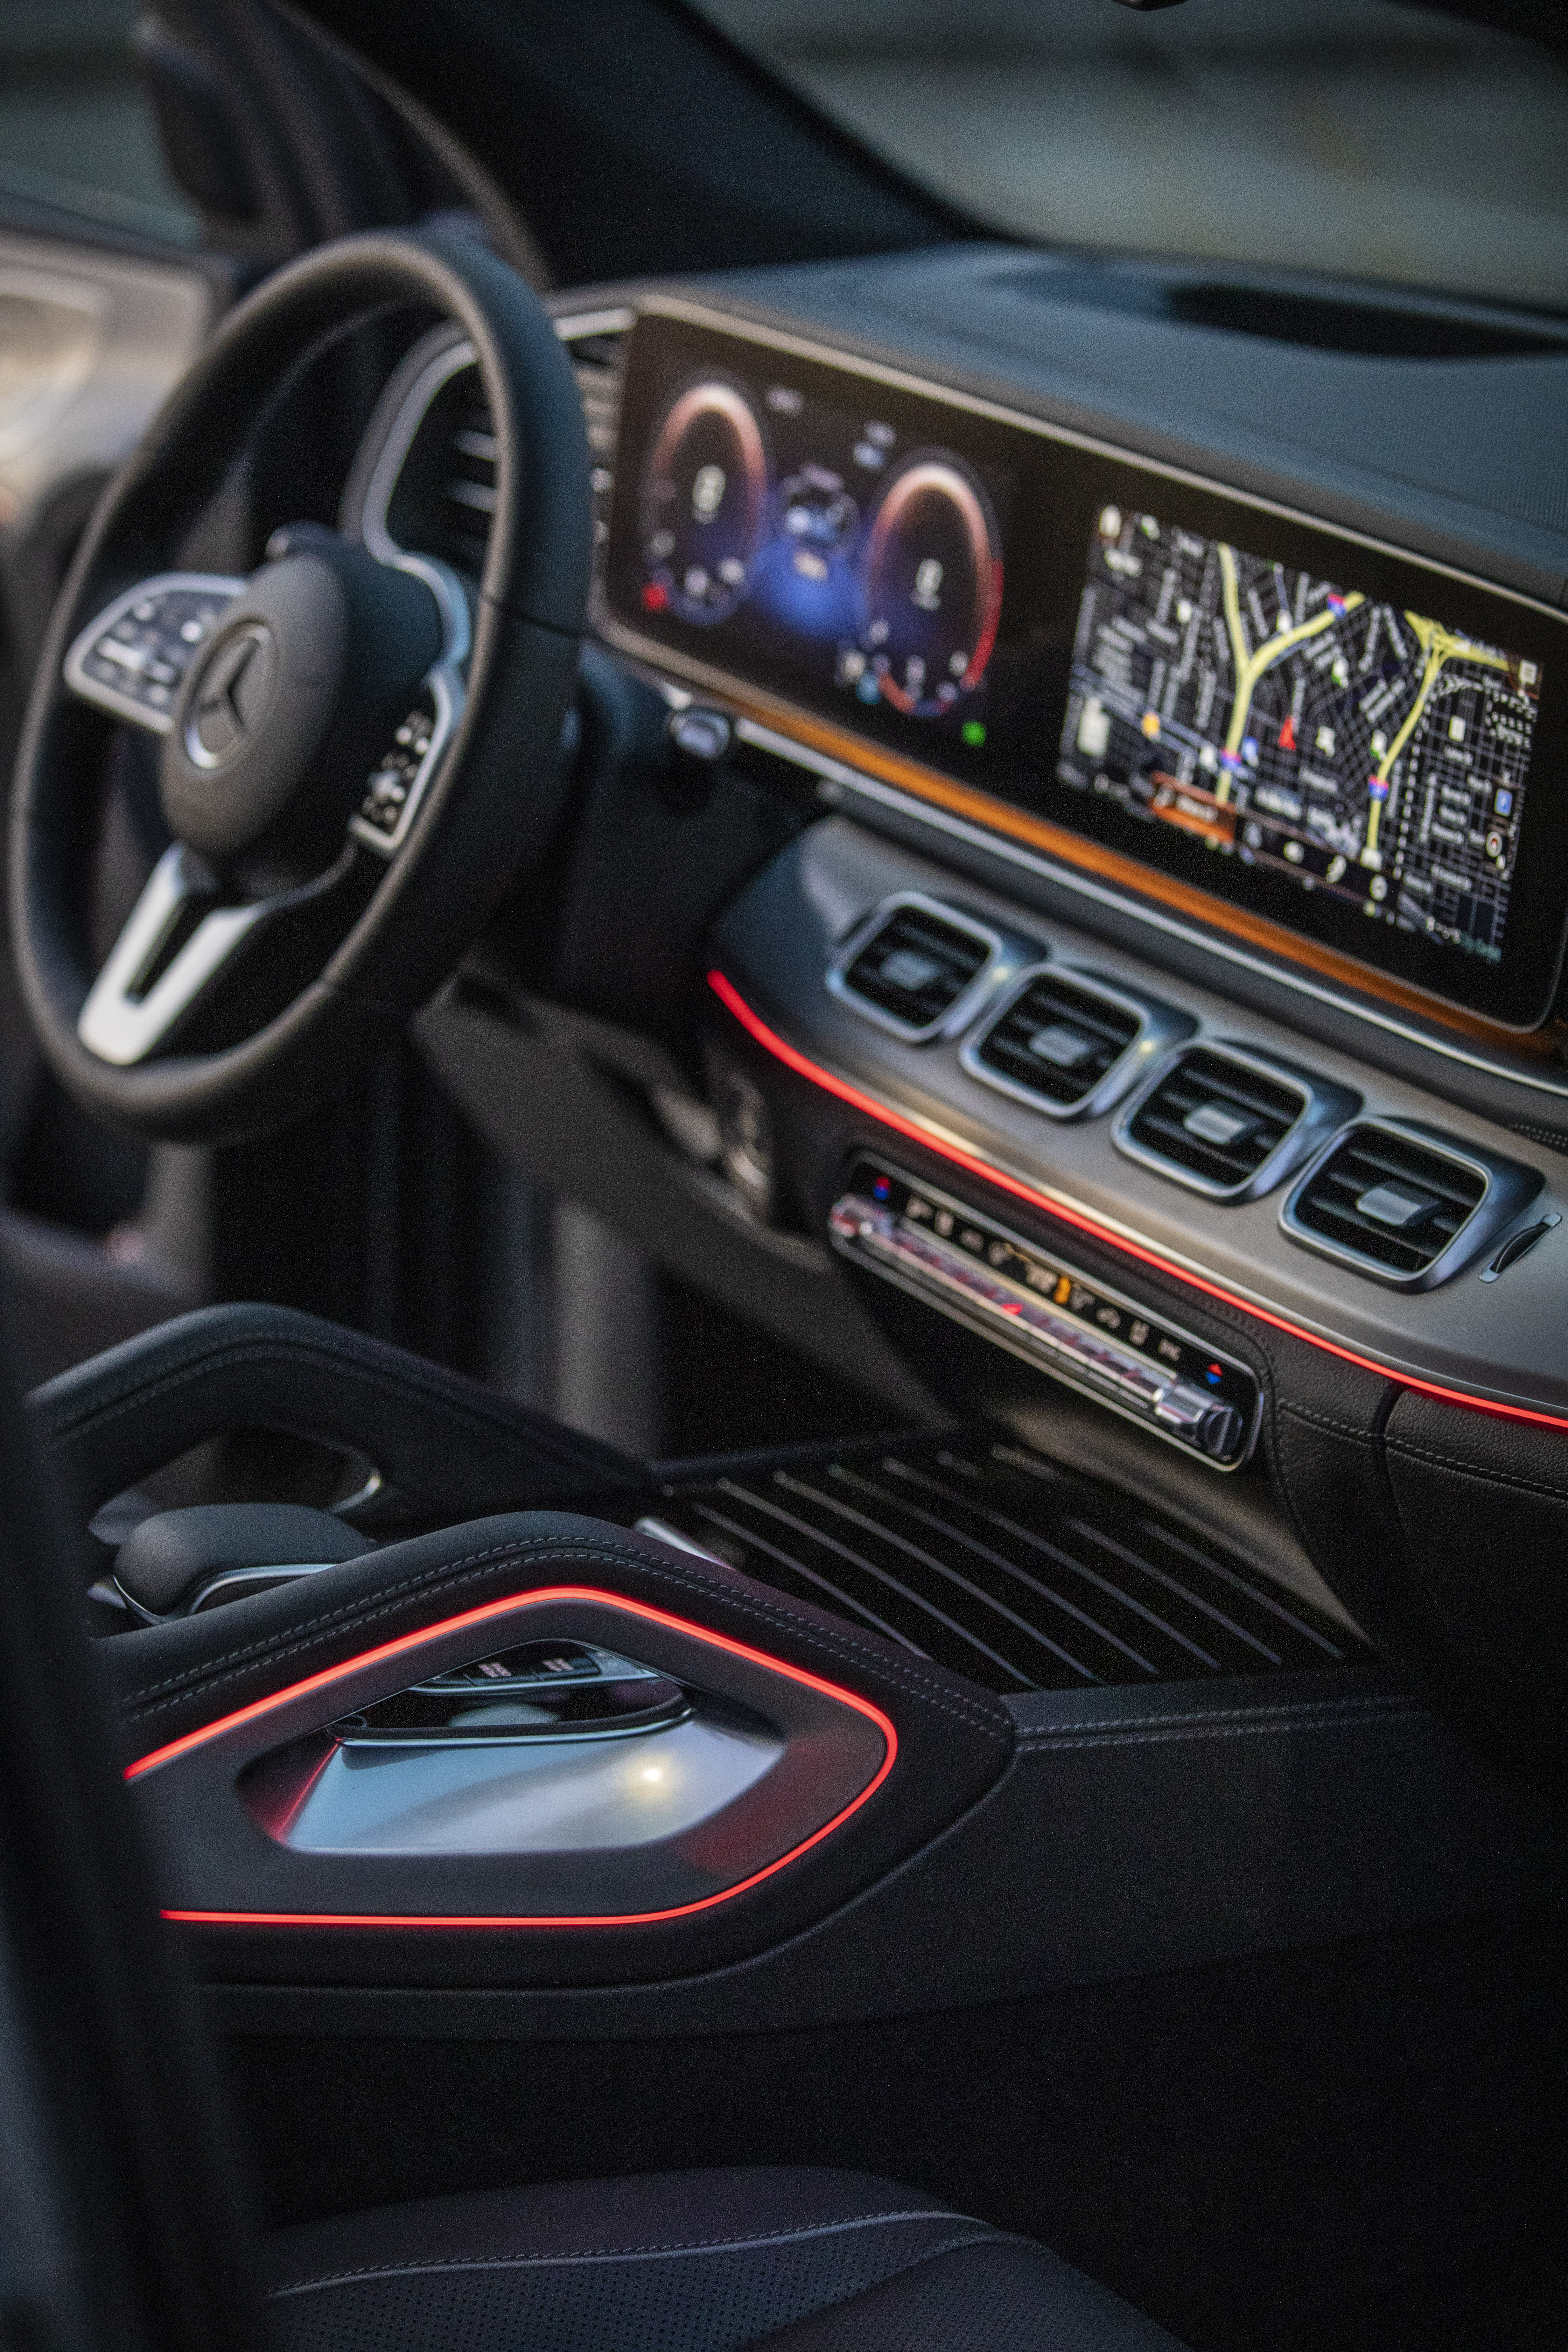 2019 Mercedes-Benz GLE.